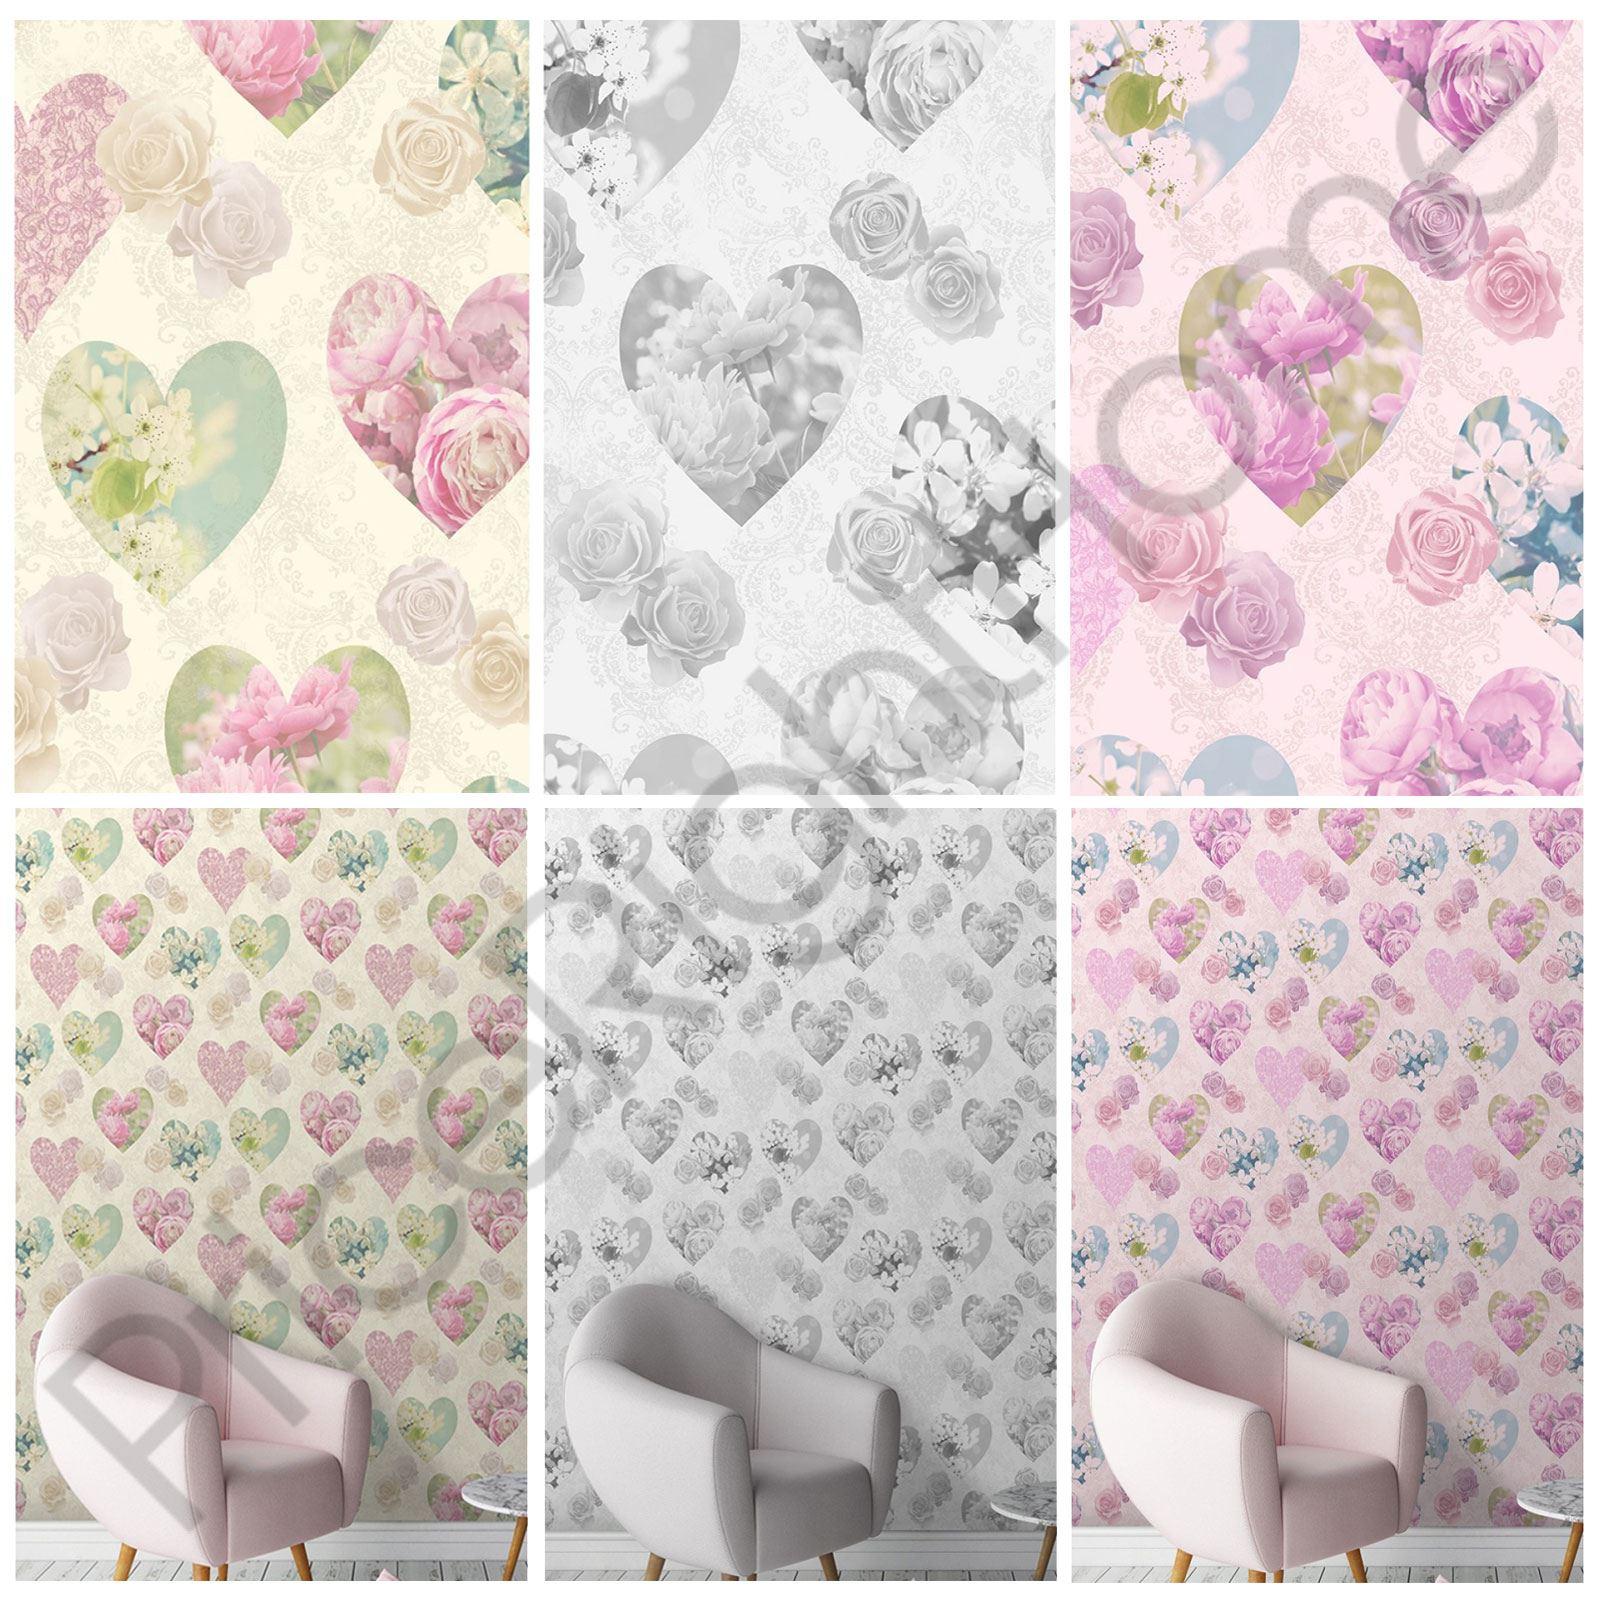 blumenmuster hearts tapete fine decor wandtapete grau lila creme neu ebay. Black Bedroom Furniture Sets. Home Design Ideas